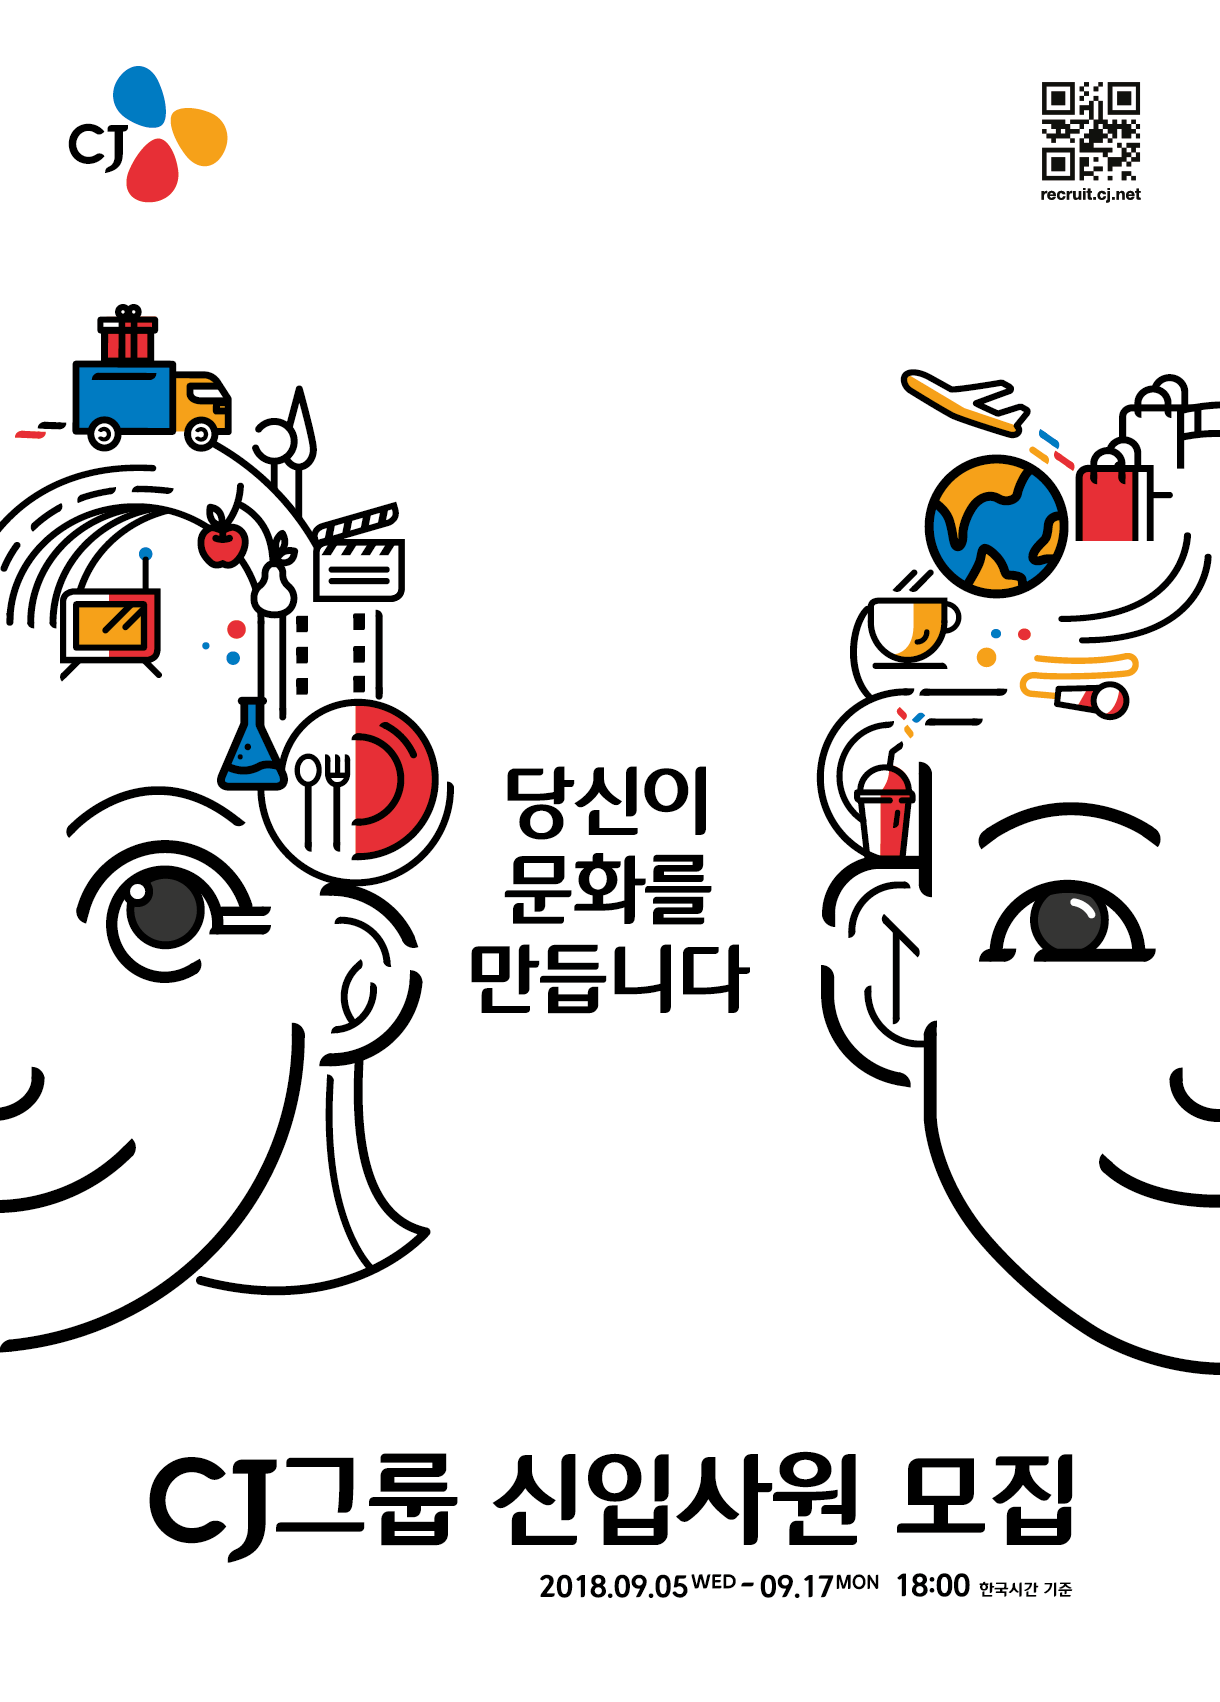 [CJ그룹] 18년 하반기 신입사원 모집 포스터.png